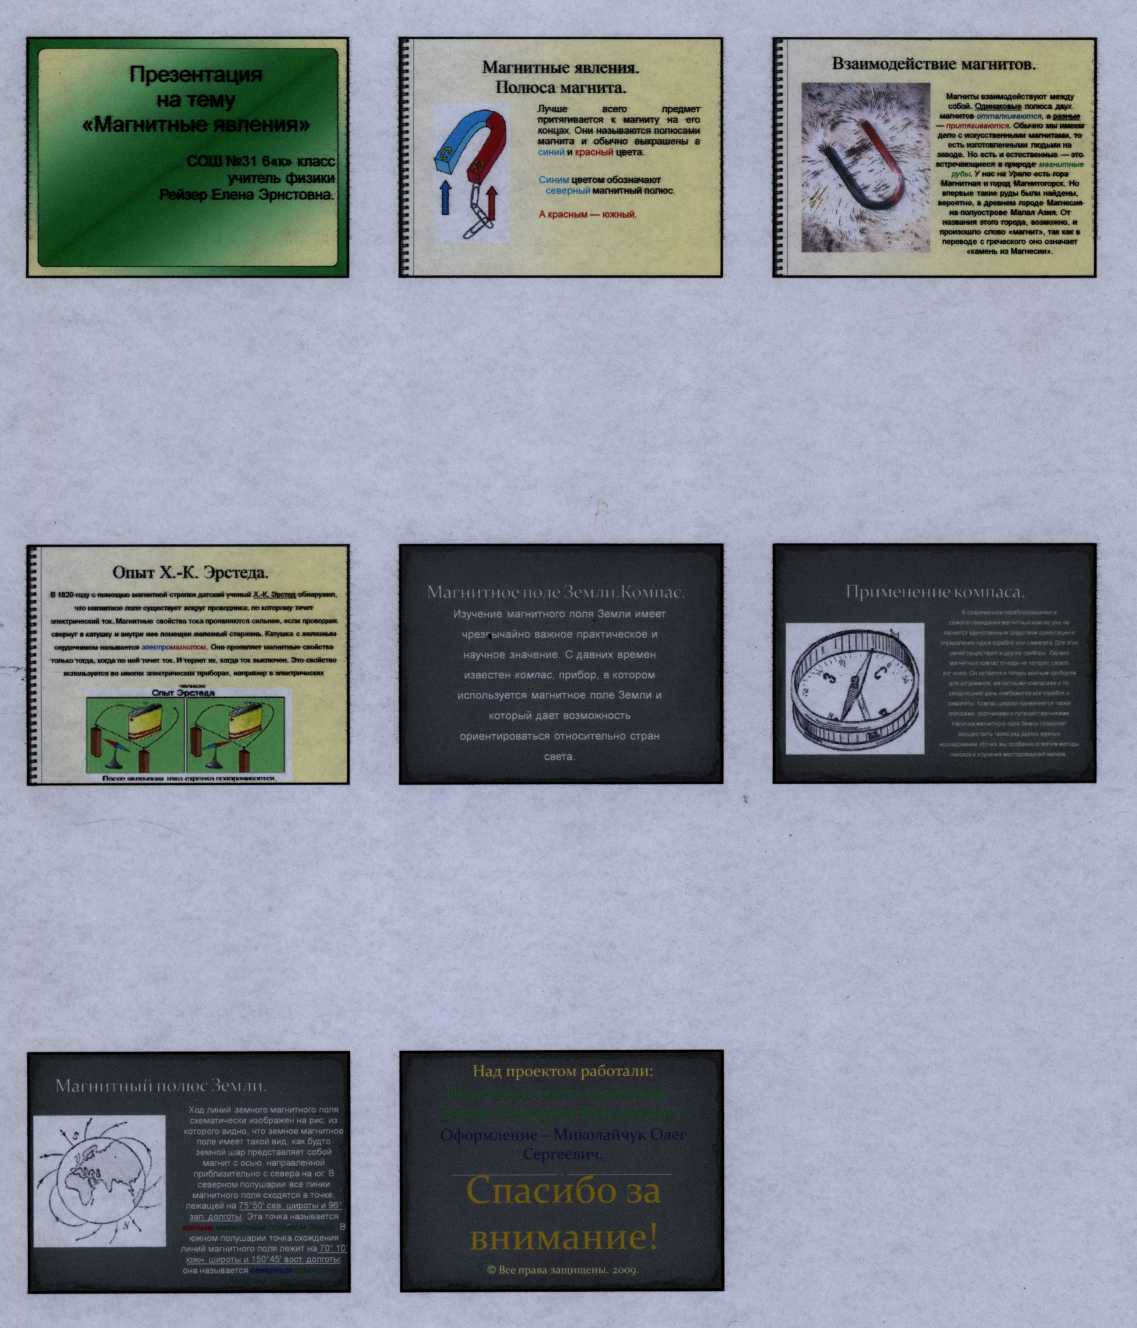 C:\Documents and Settings\Admin\Рабочий стол\media\image1.jpeg